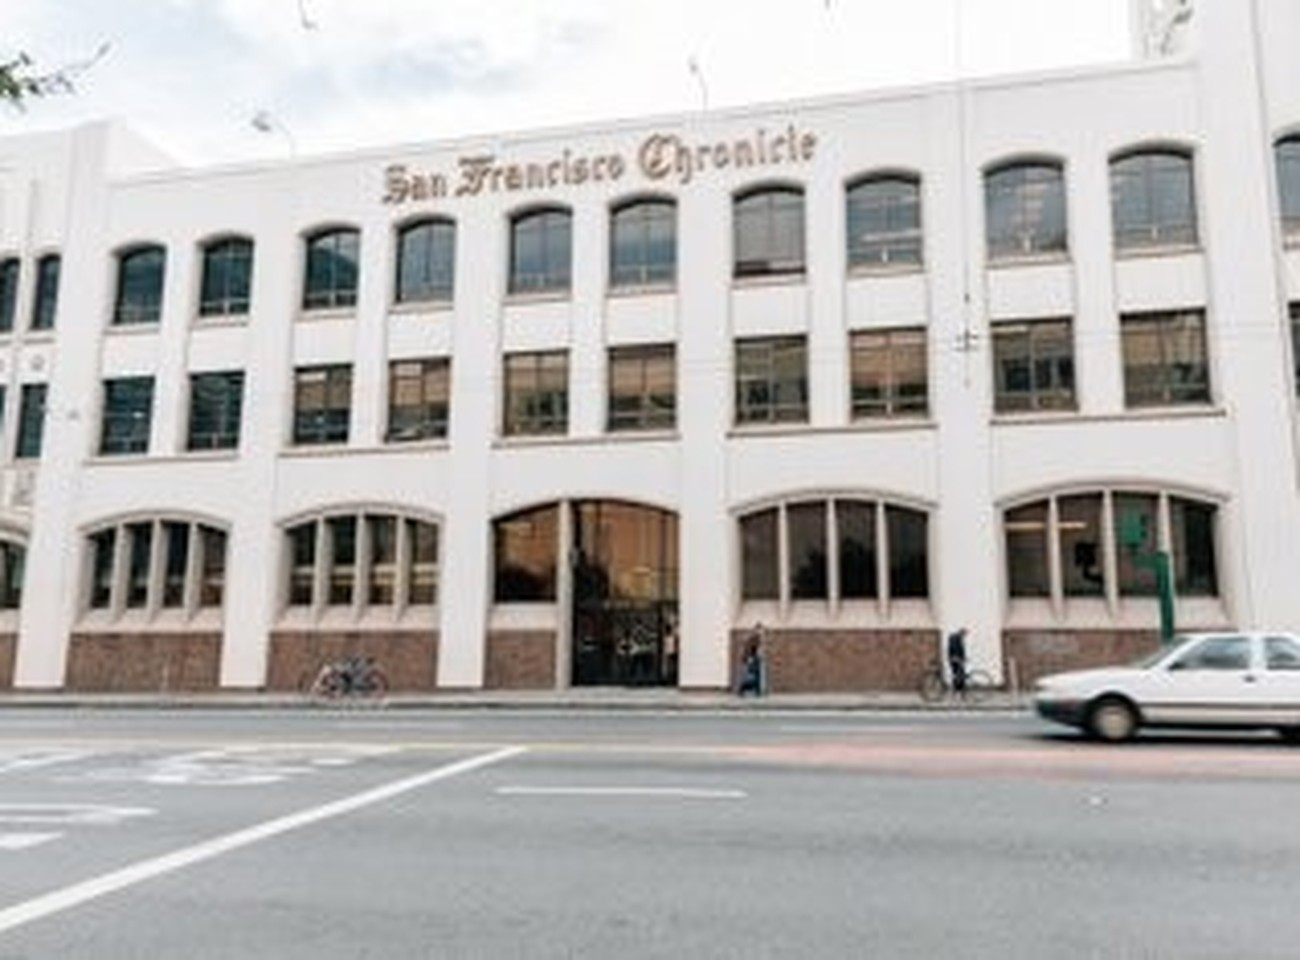 San Francisco Chronicle Careers